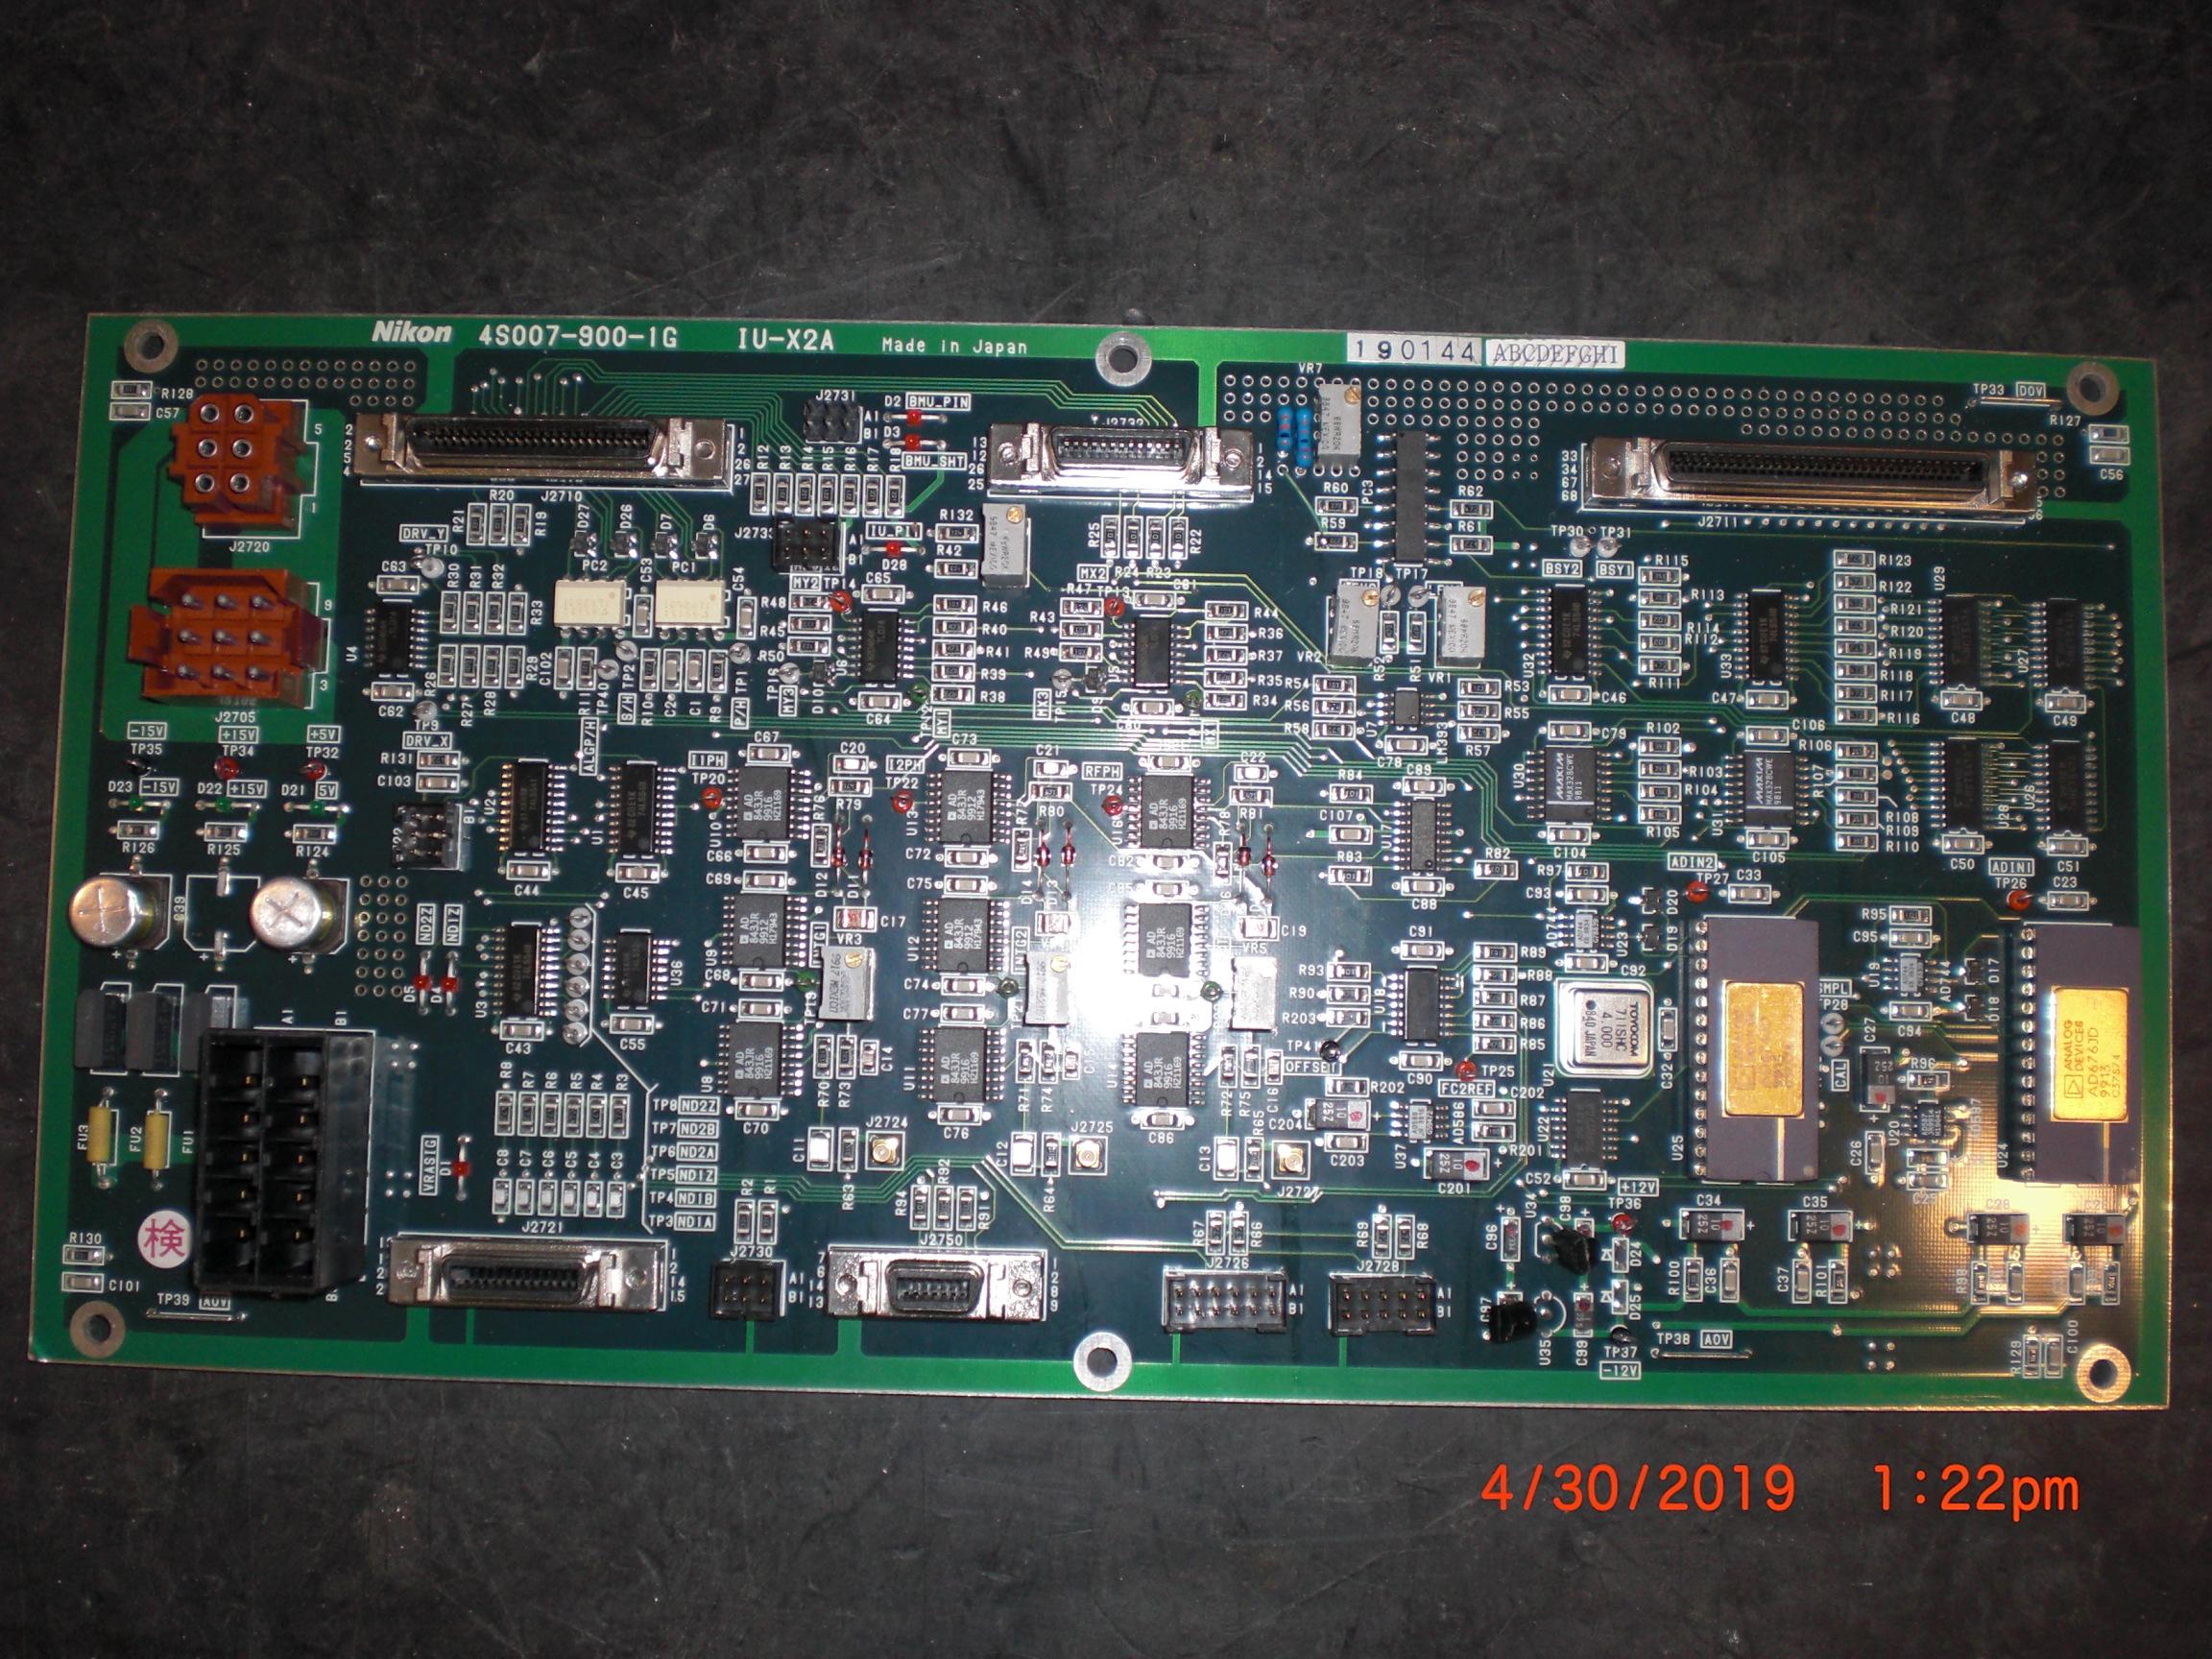 PCB NIKON 4S007-900-1 IU-X2A Step and Repeat